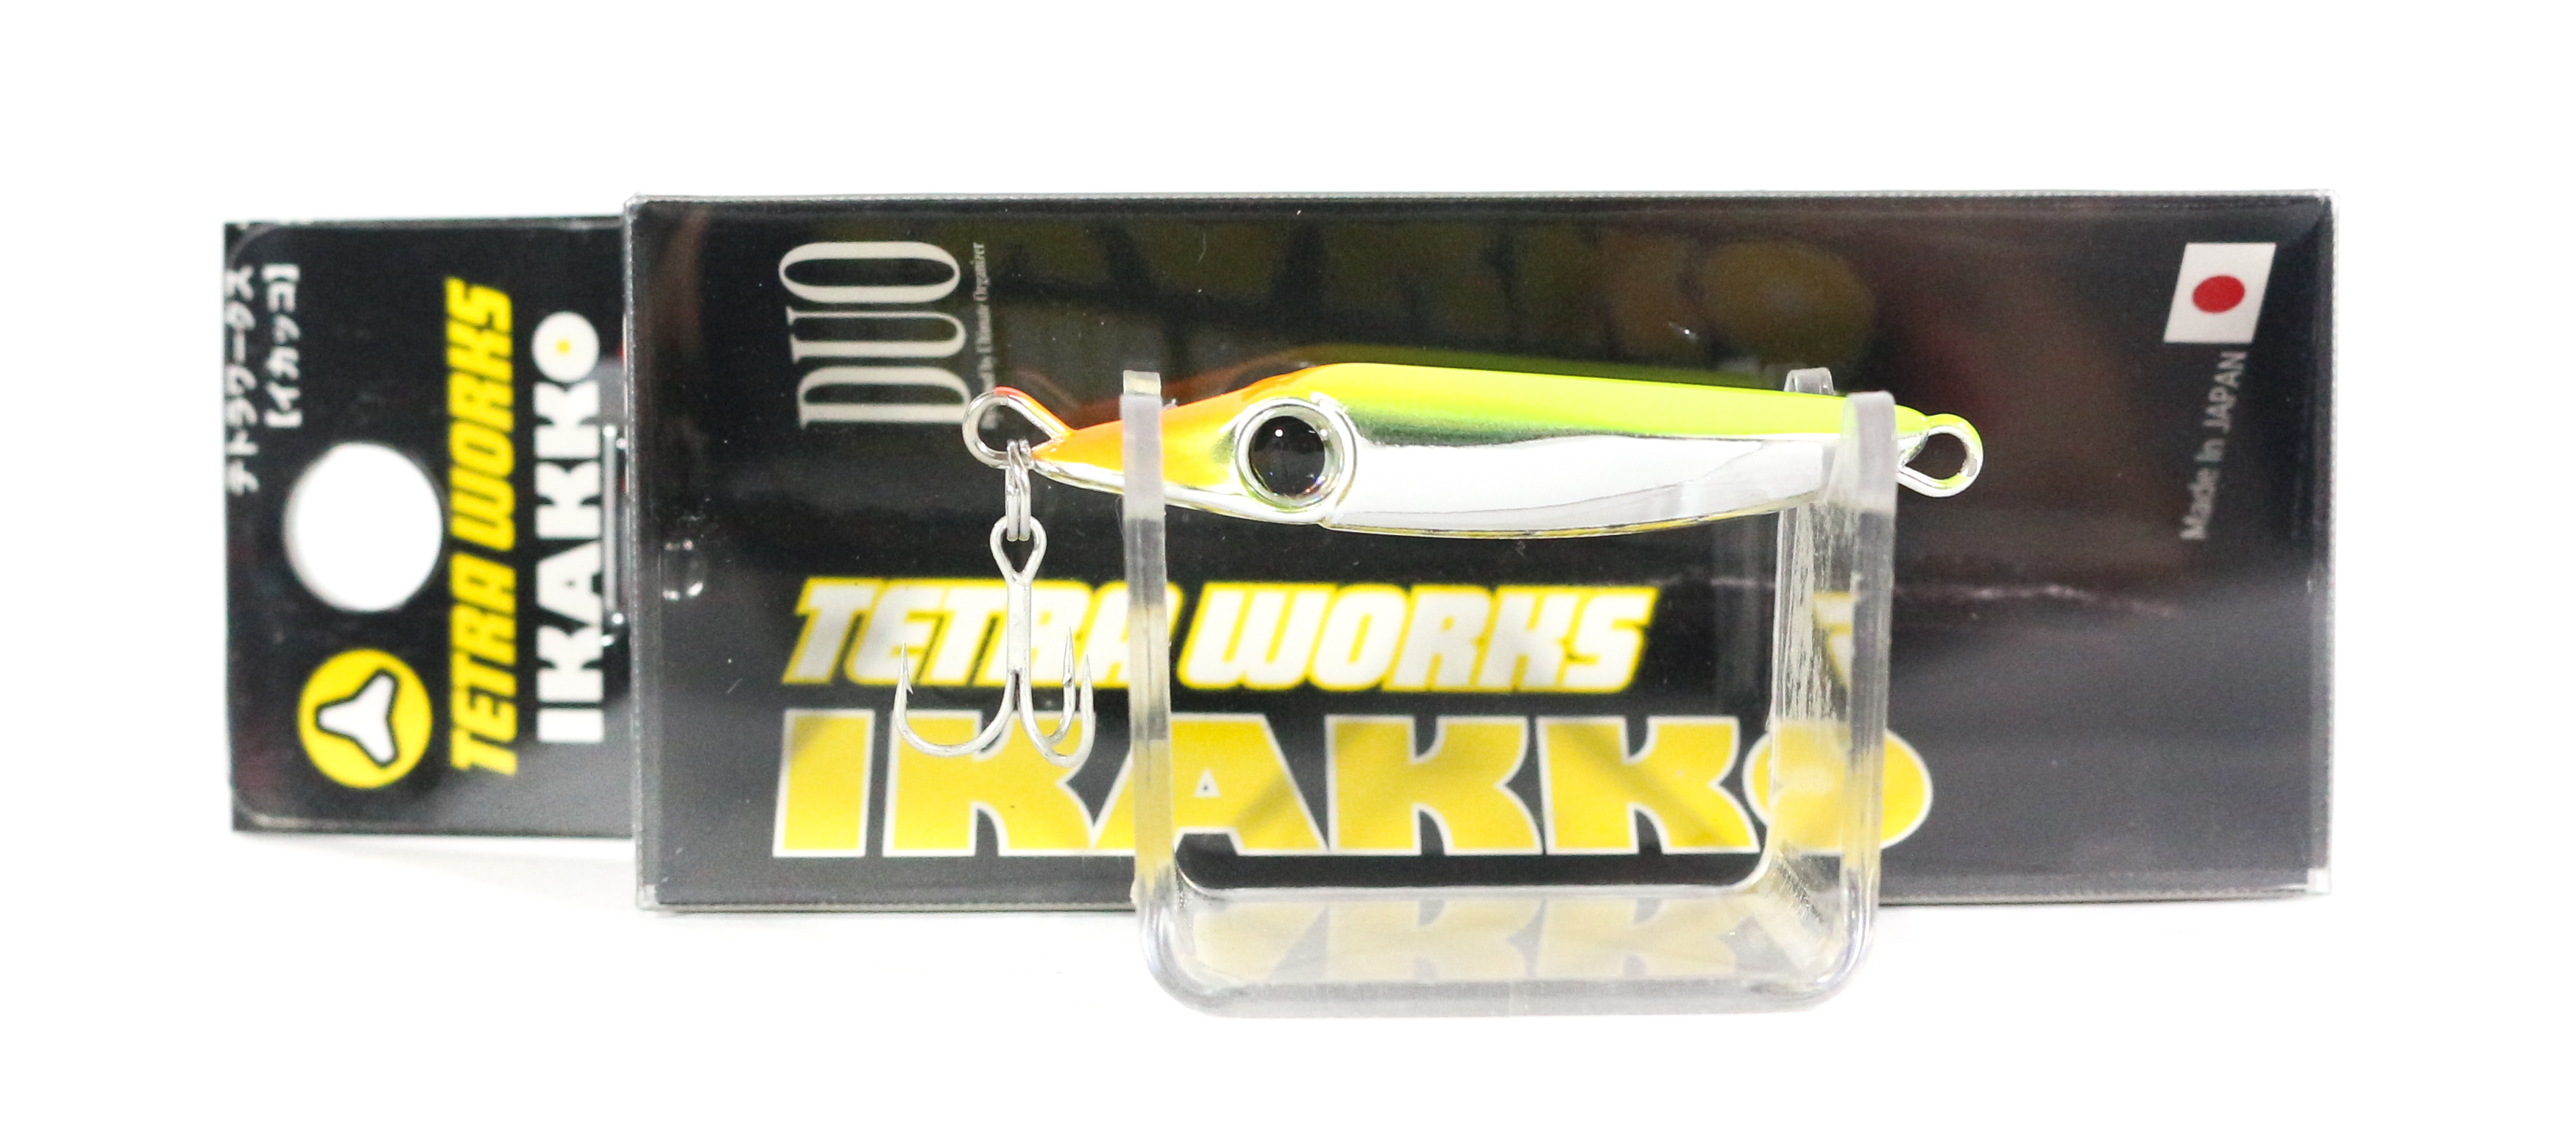 Duo Tetra Works Ikakko 38 mm Sinking Lure MCC0003 (5376)